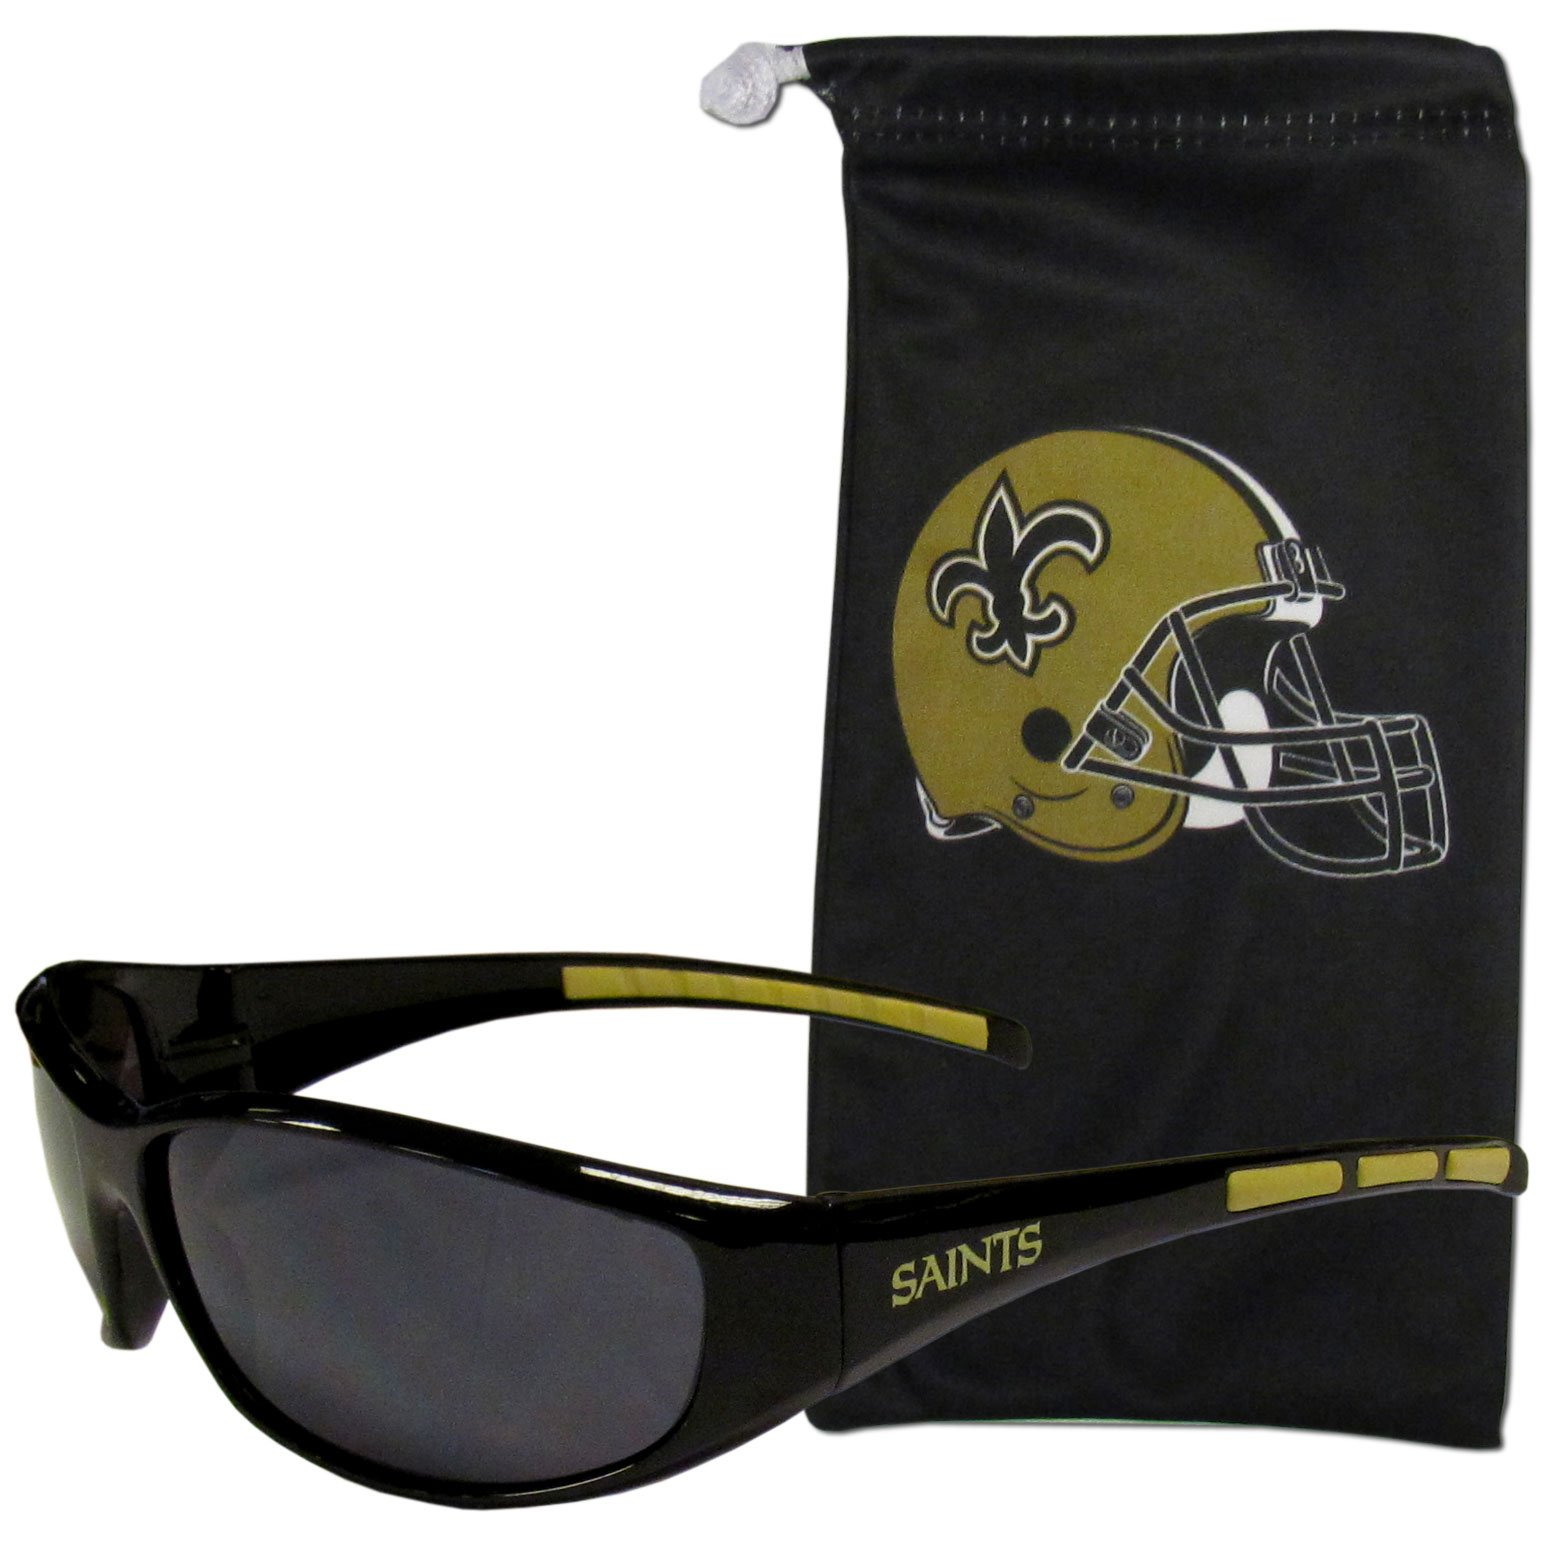 NFL New Orleans Saints Adult Sunglass and Bag Set, Black